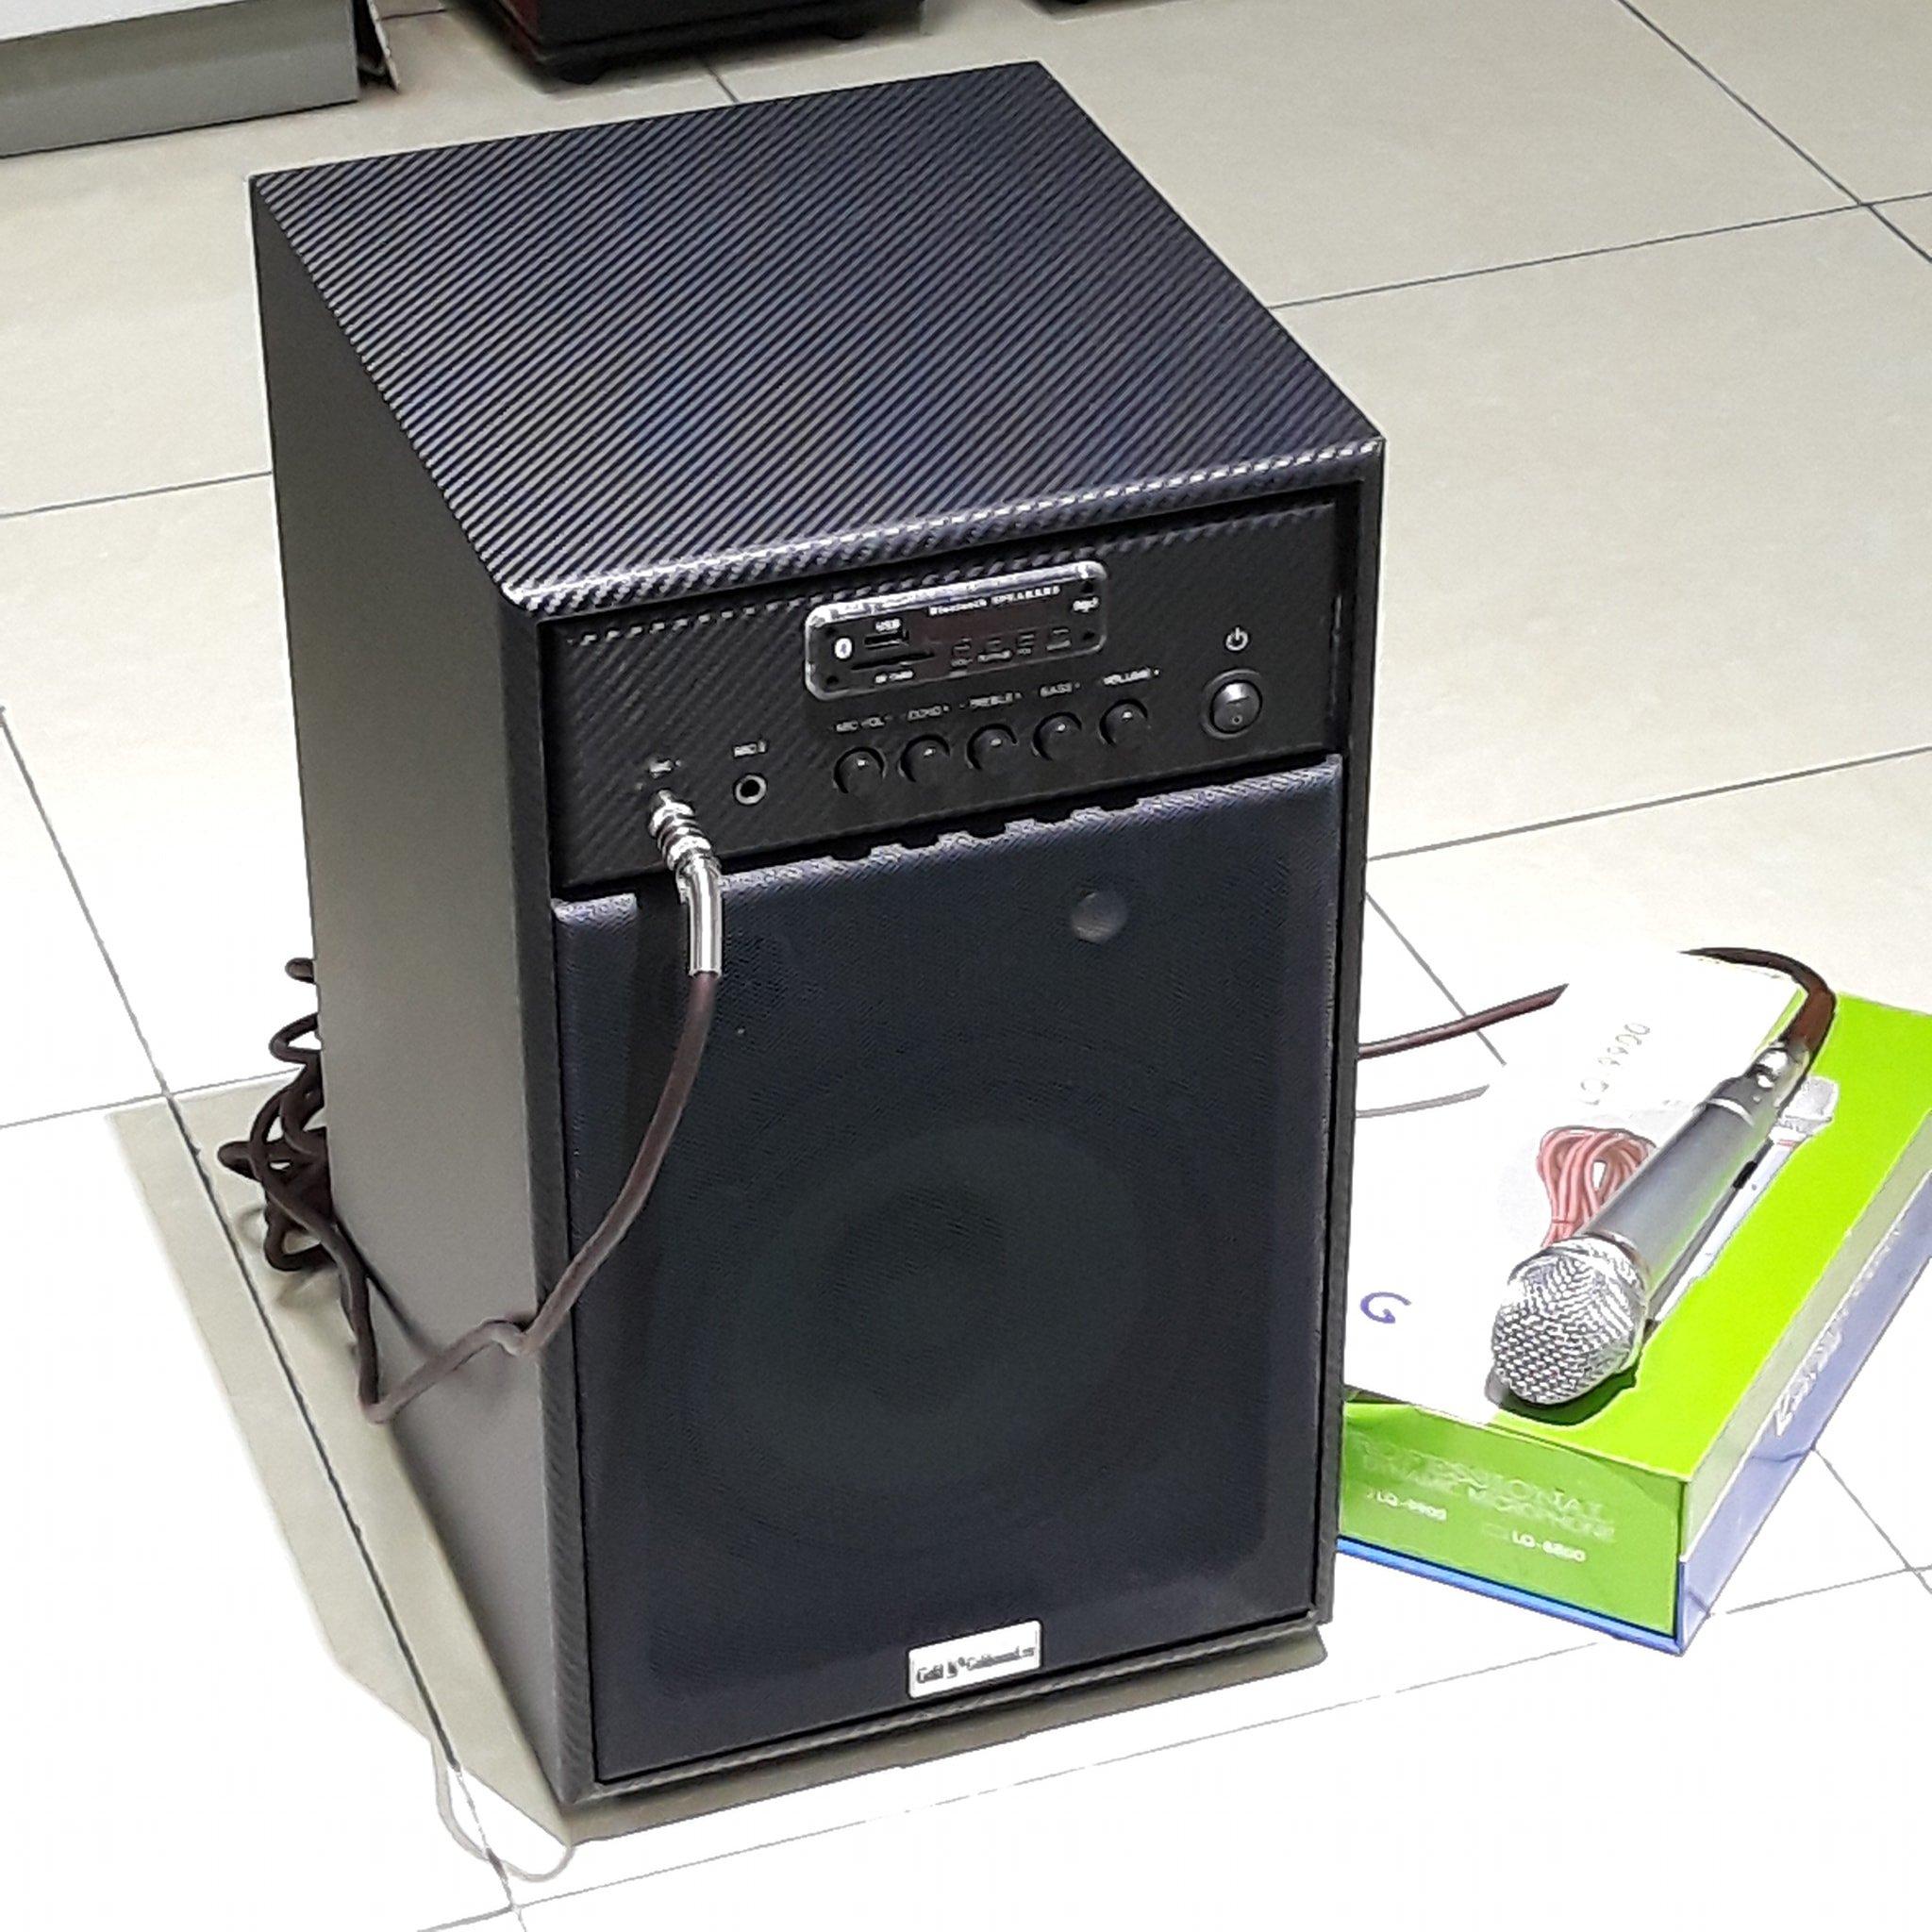 Loa nghe nhạc, loa bluetooth: Xả kho BÌNH TÂN HCM, 4 bộ loa Bluetooth chỉ từ 399k